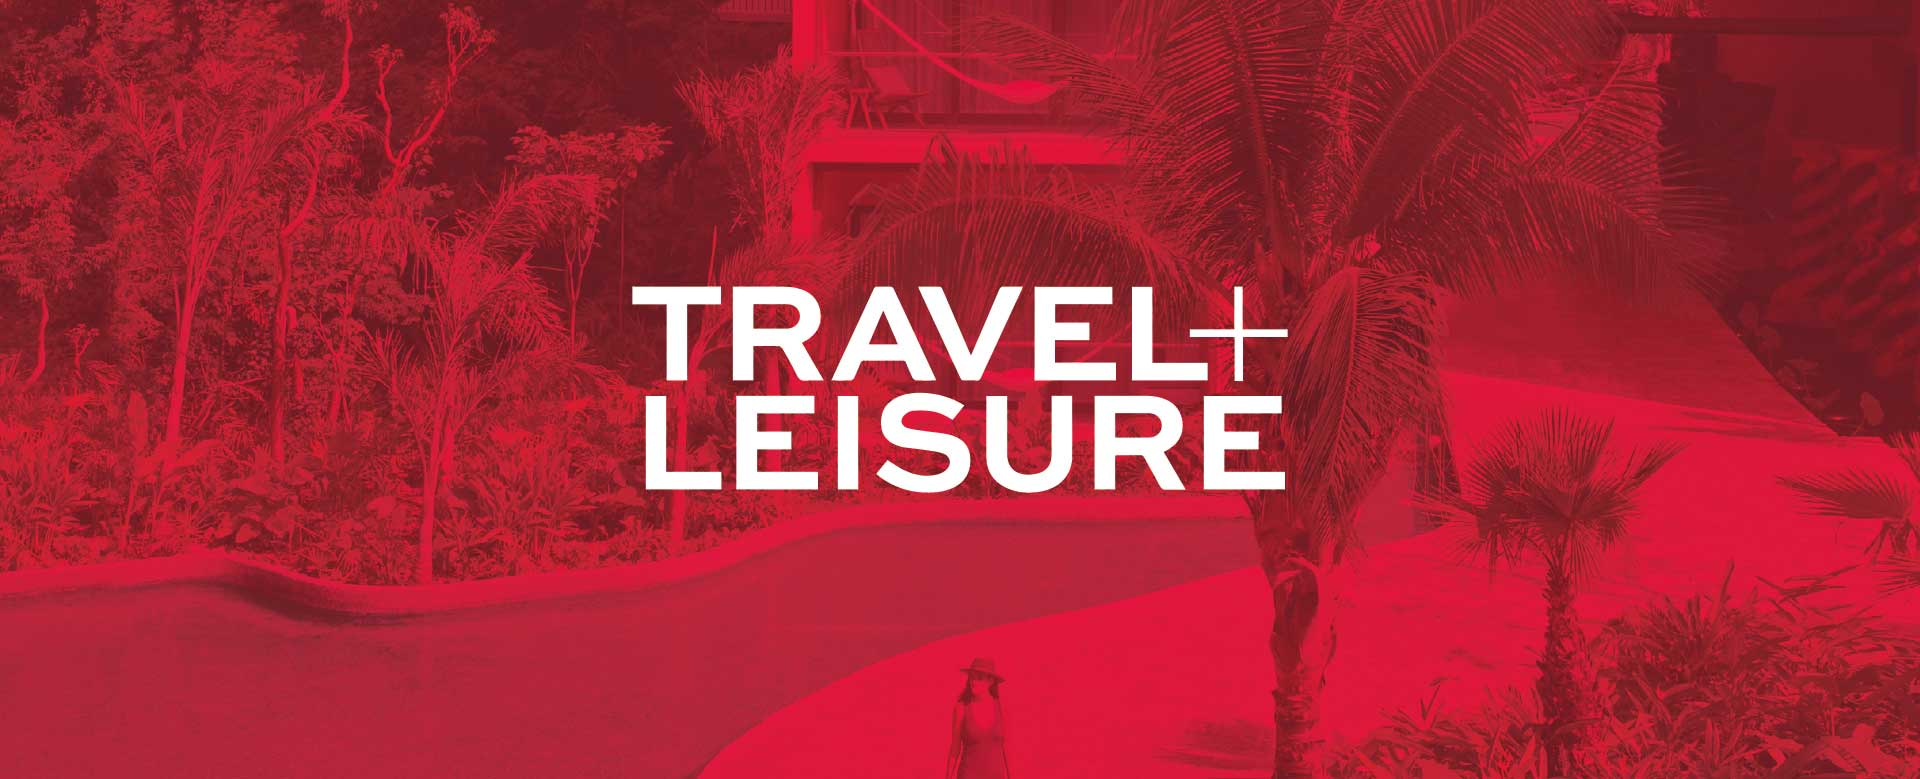 Travel + Leisure Mexico bg